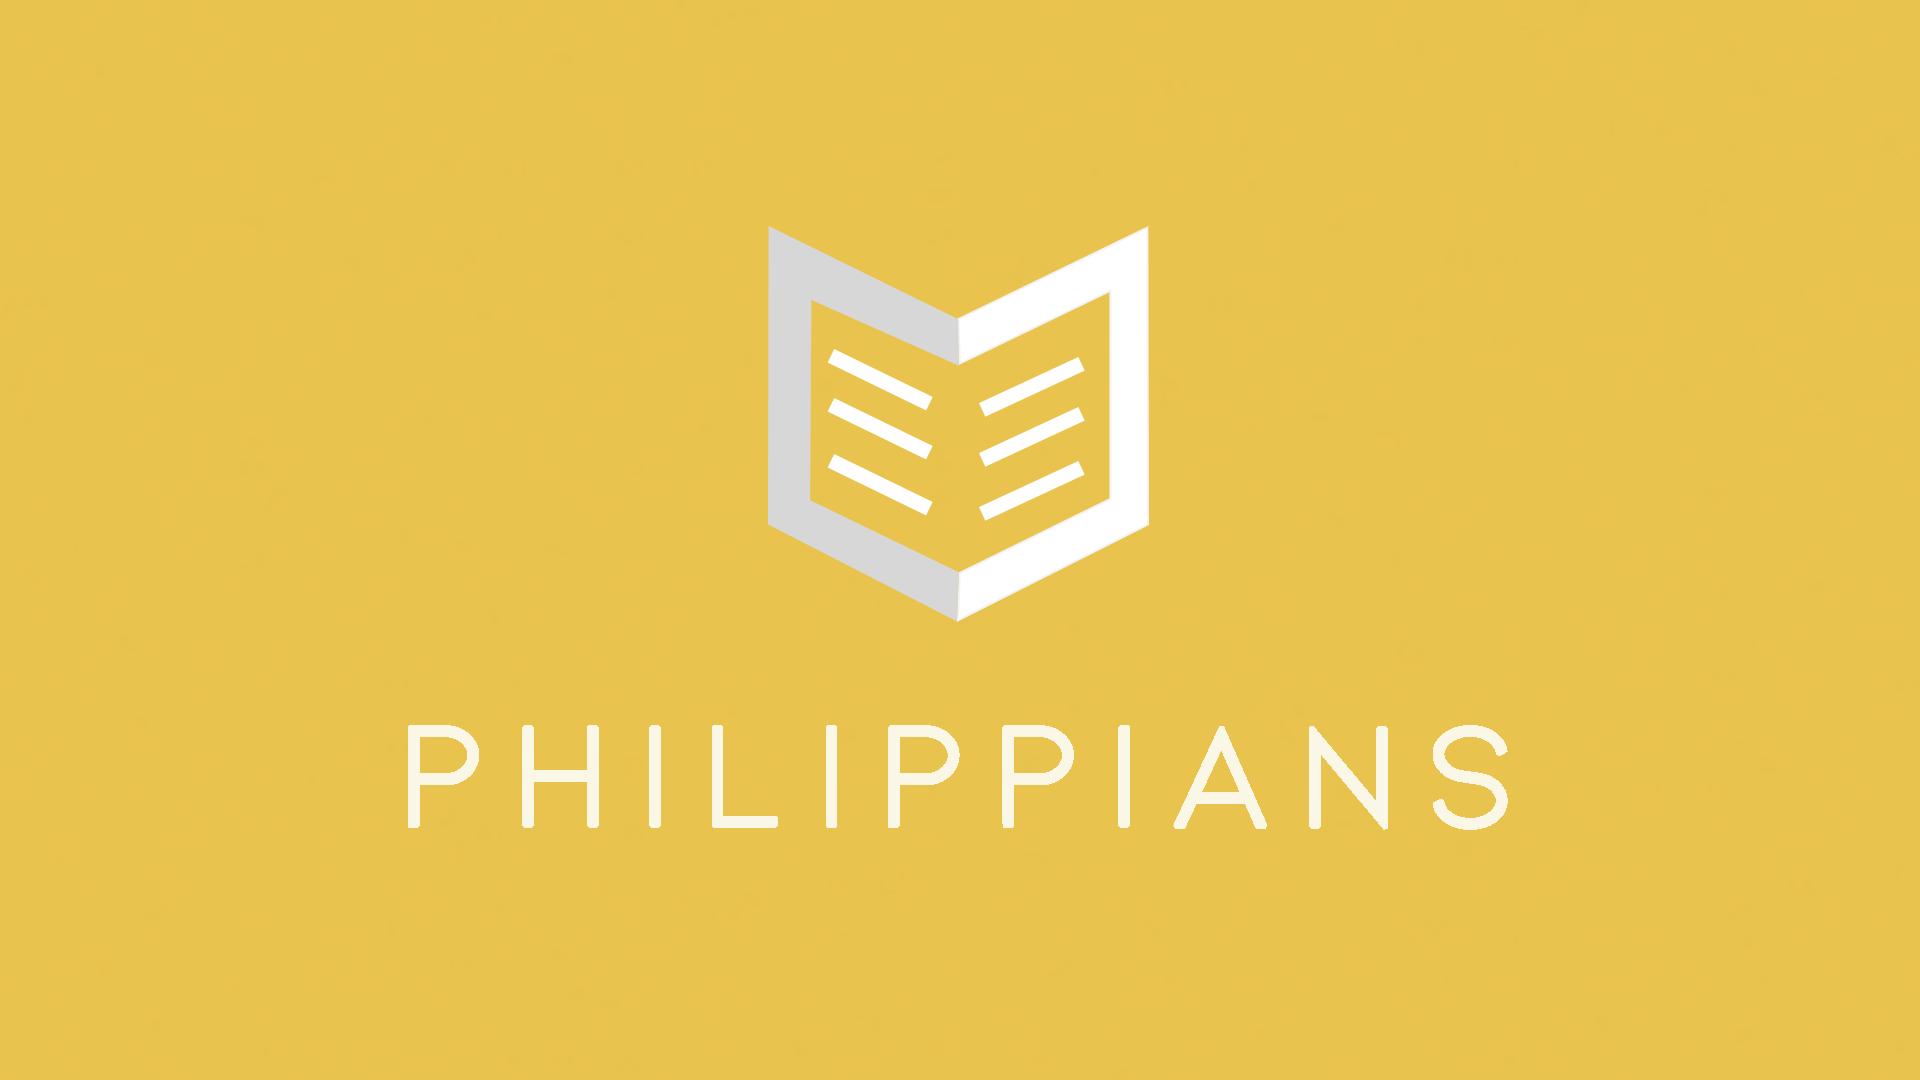 phillipians series .png